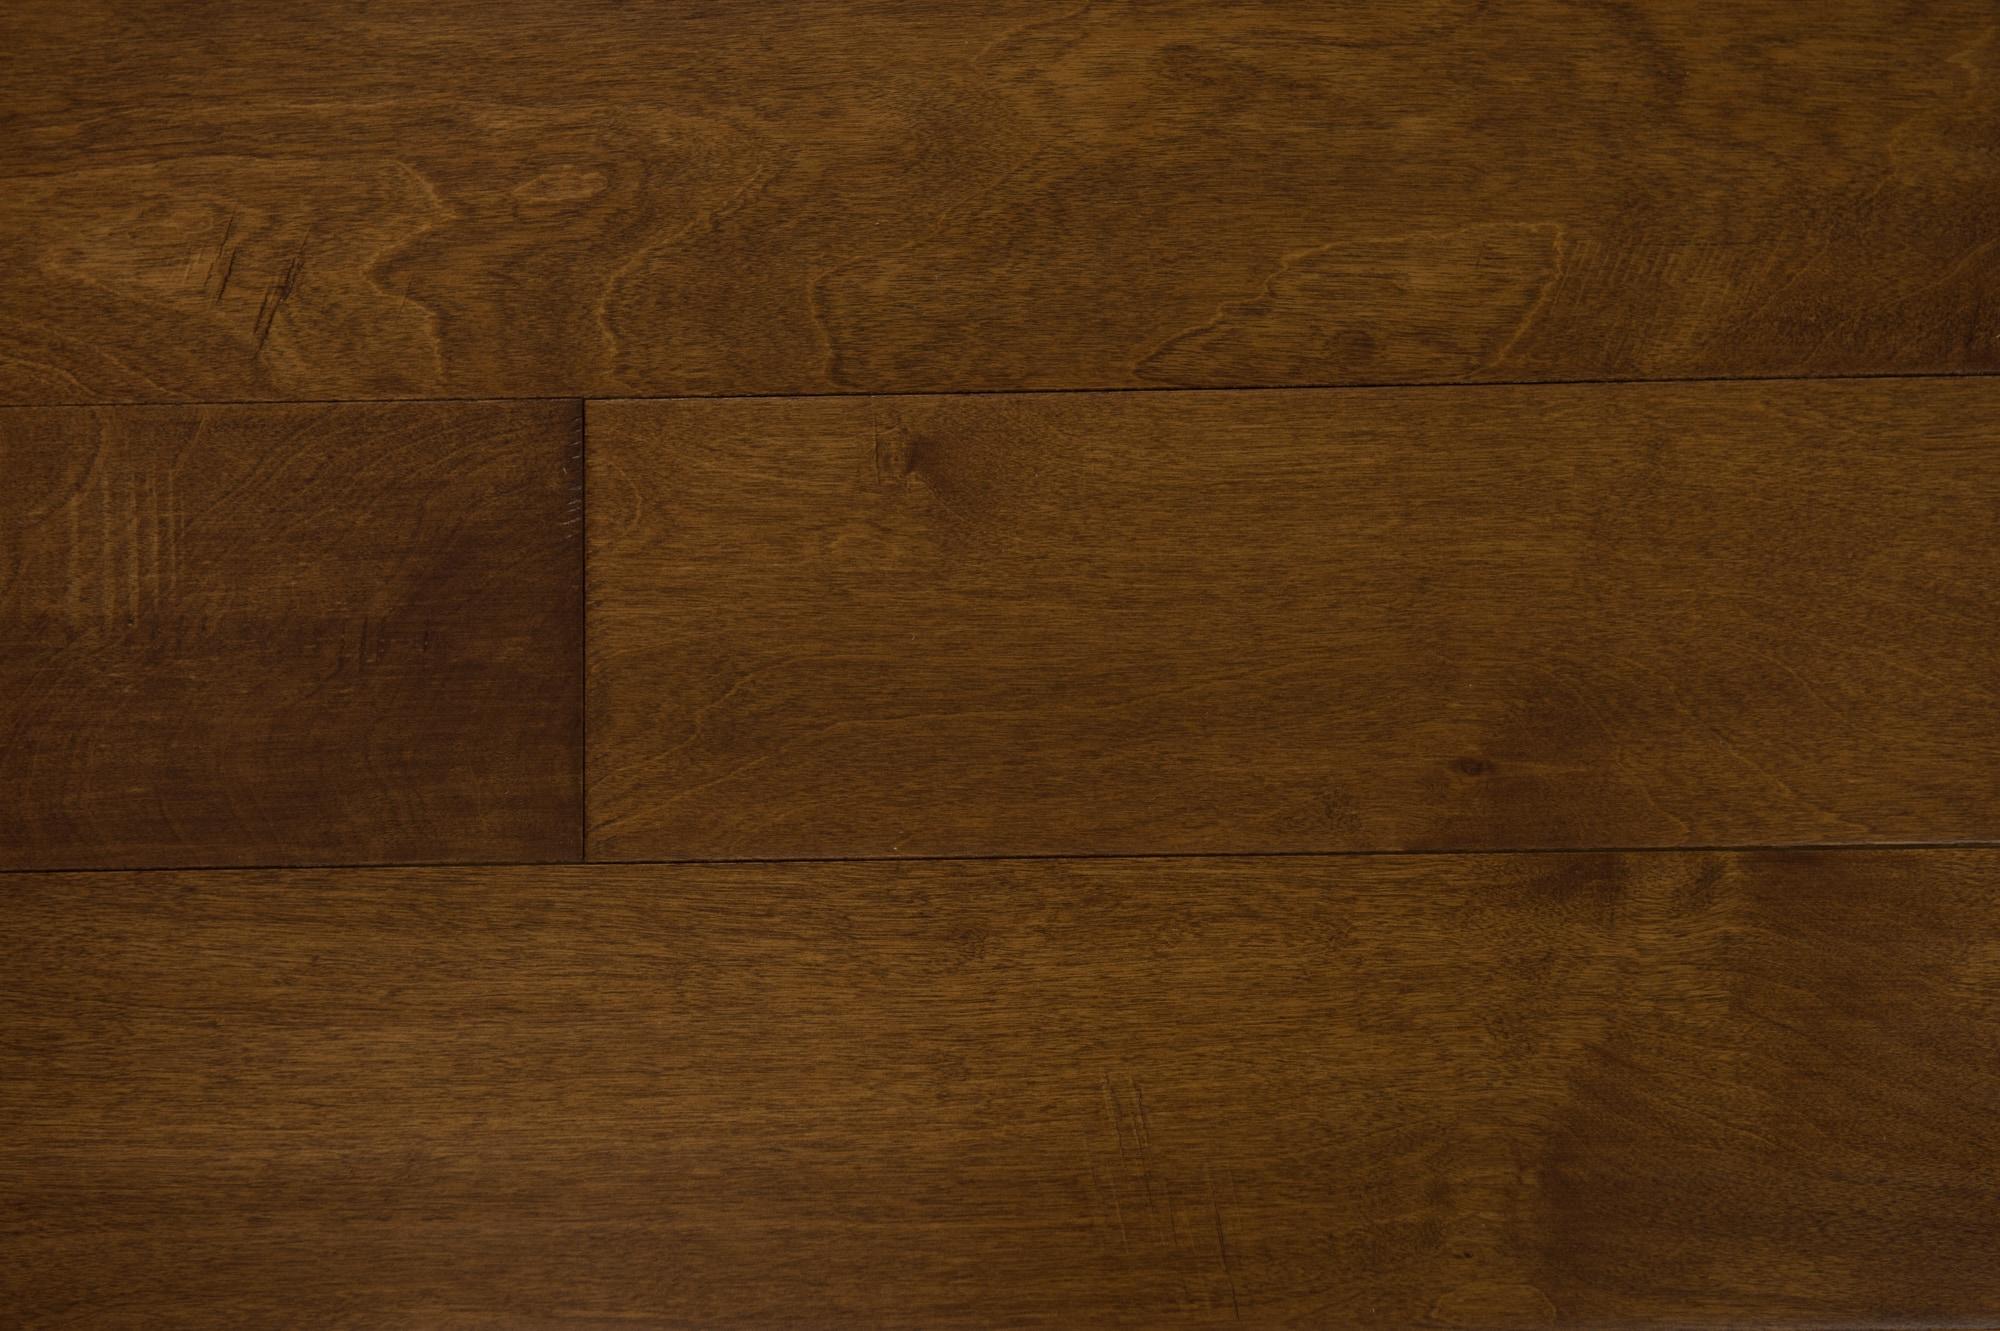 Caramel / Baltic Birch / Urethane / ABC / Sample Engineered Hardwood - Baltic Birch - Bonaventure Collection 0